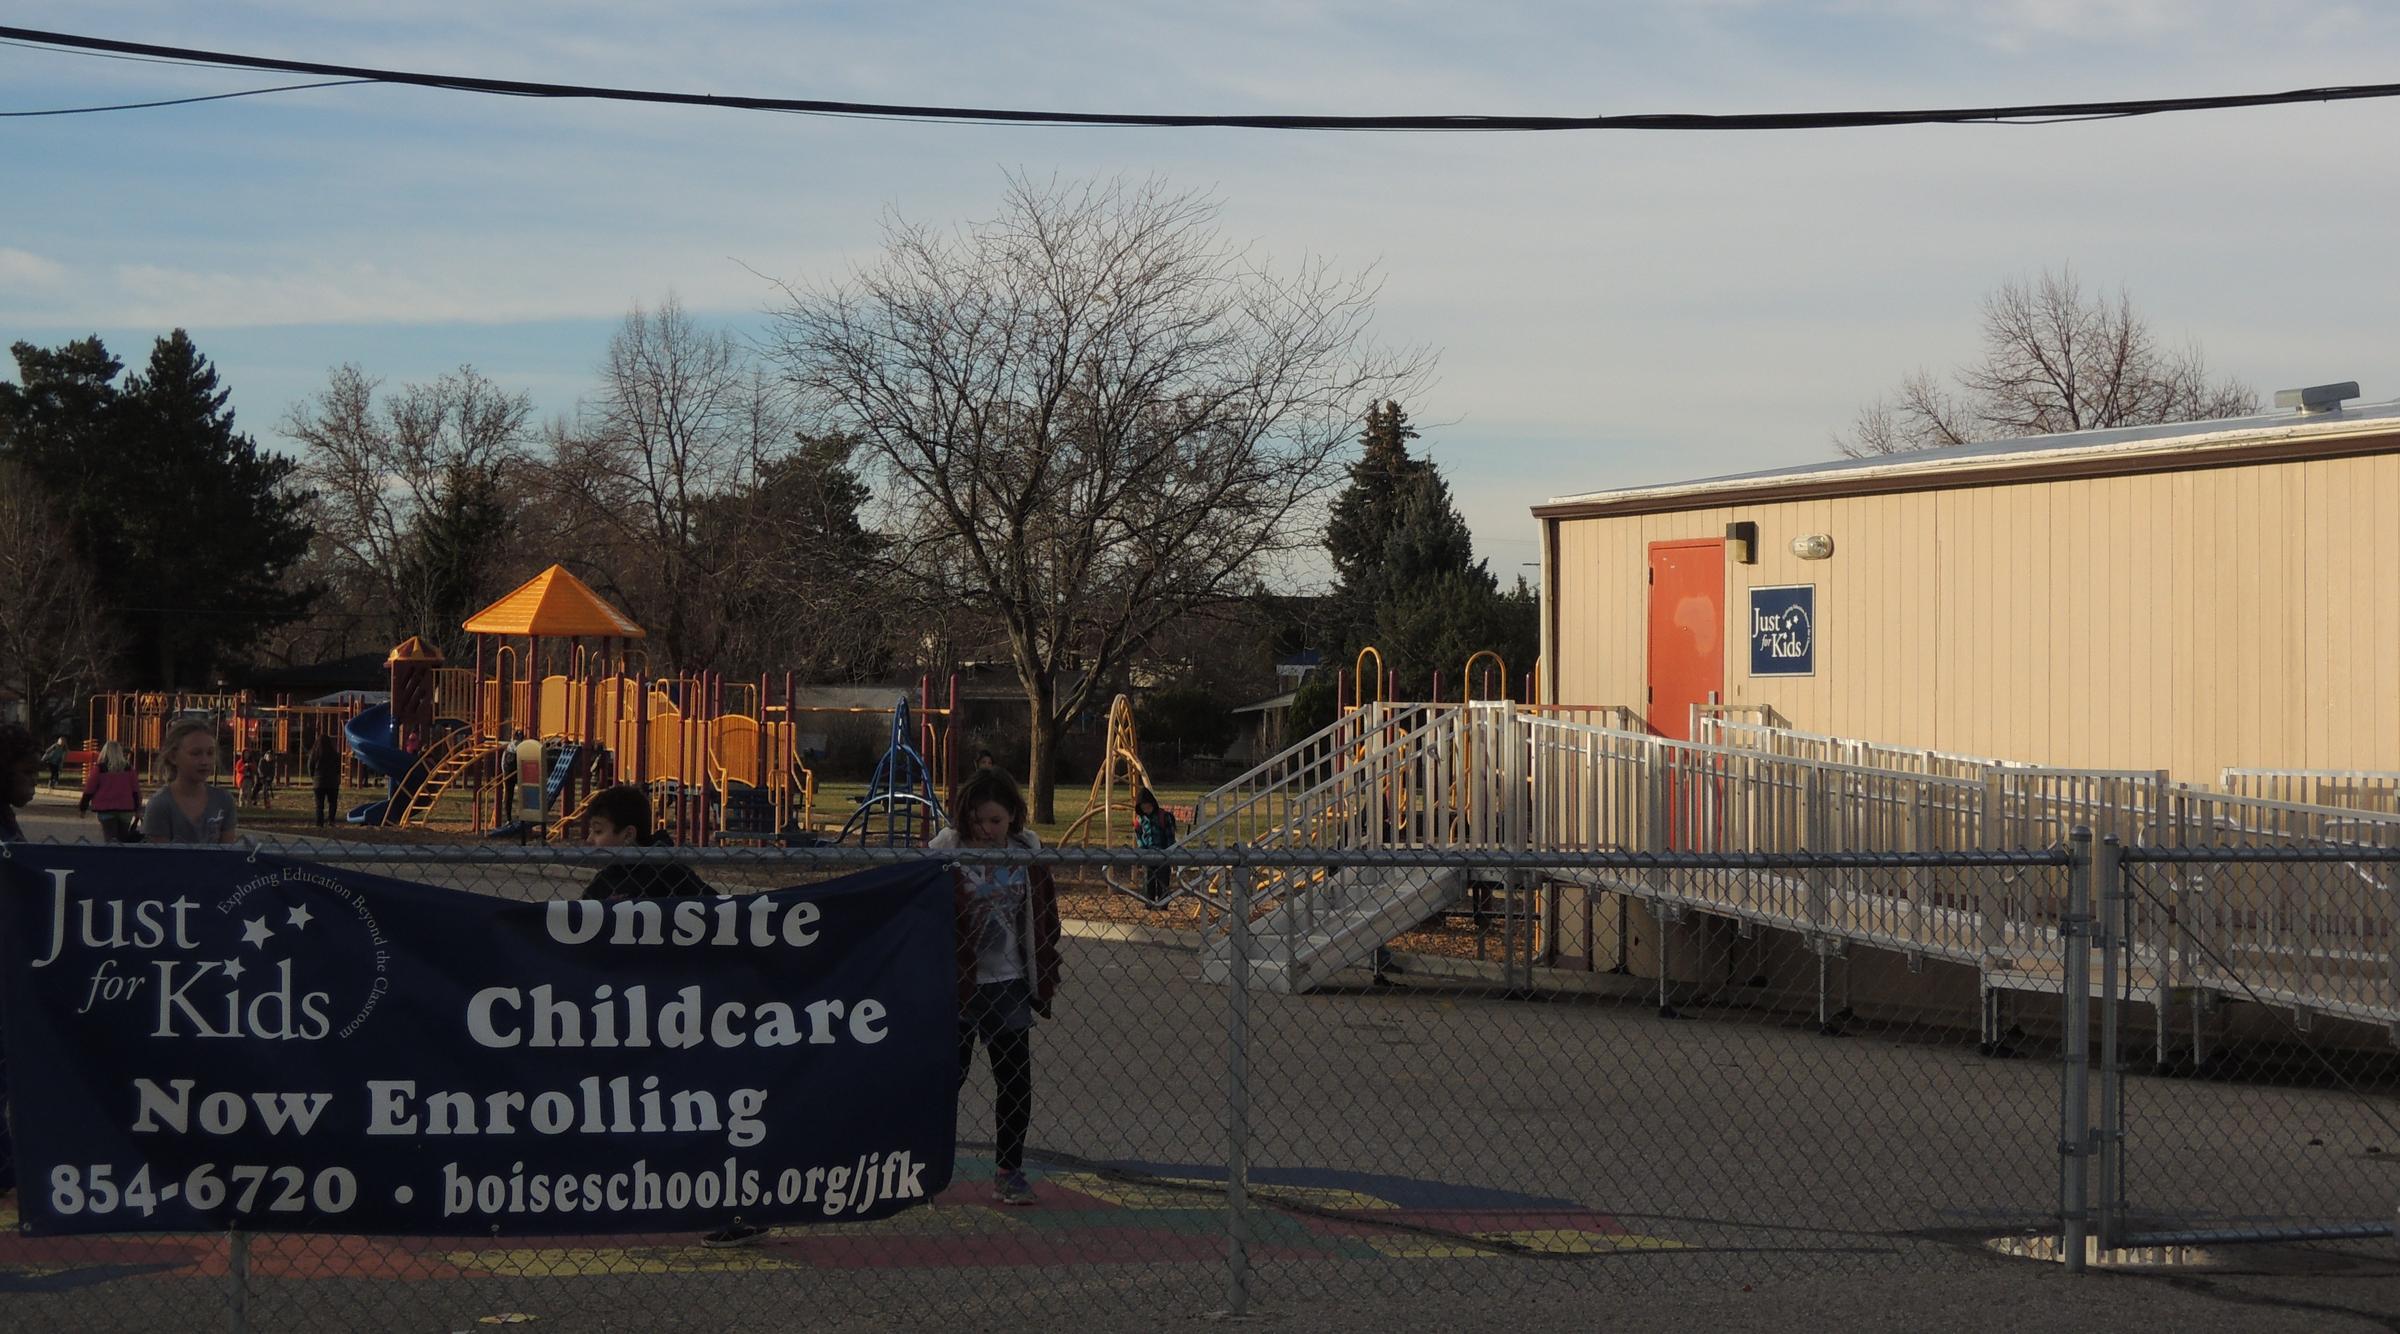 preschools in boise boise schools city team up to launch preschool 455